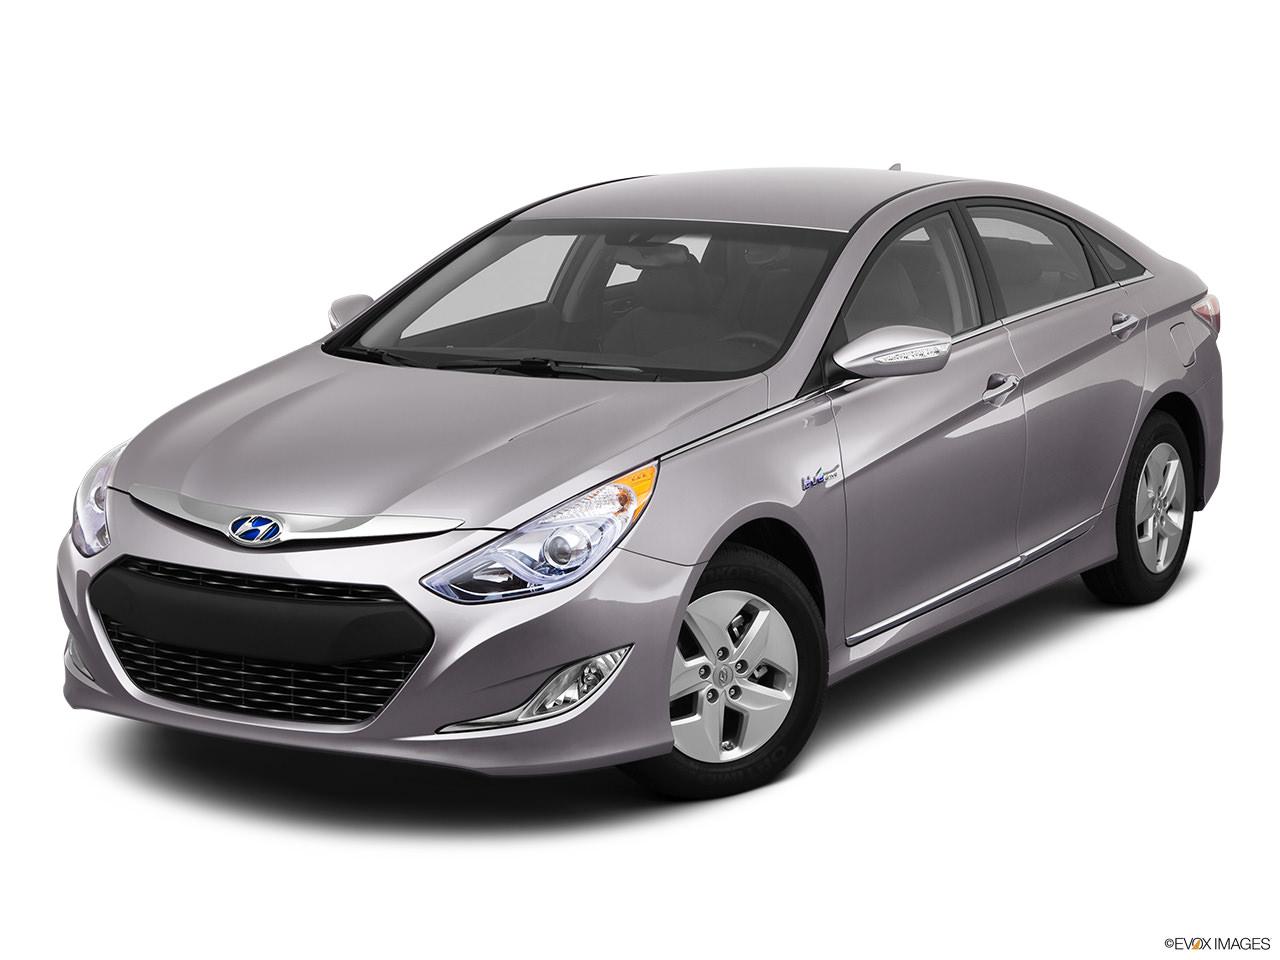 2012 Hyundai Sonata vs  2012 Hyundai Elantra: Which One Should I Buy